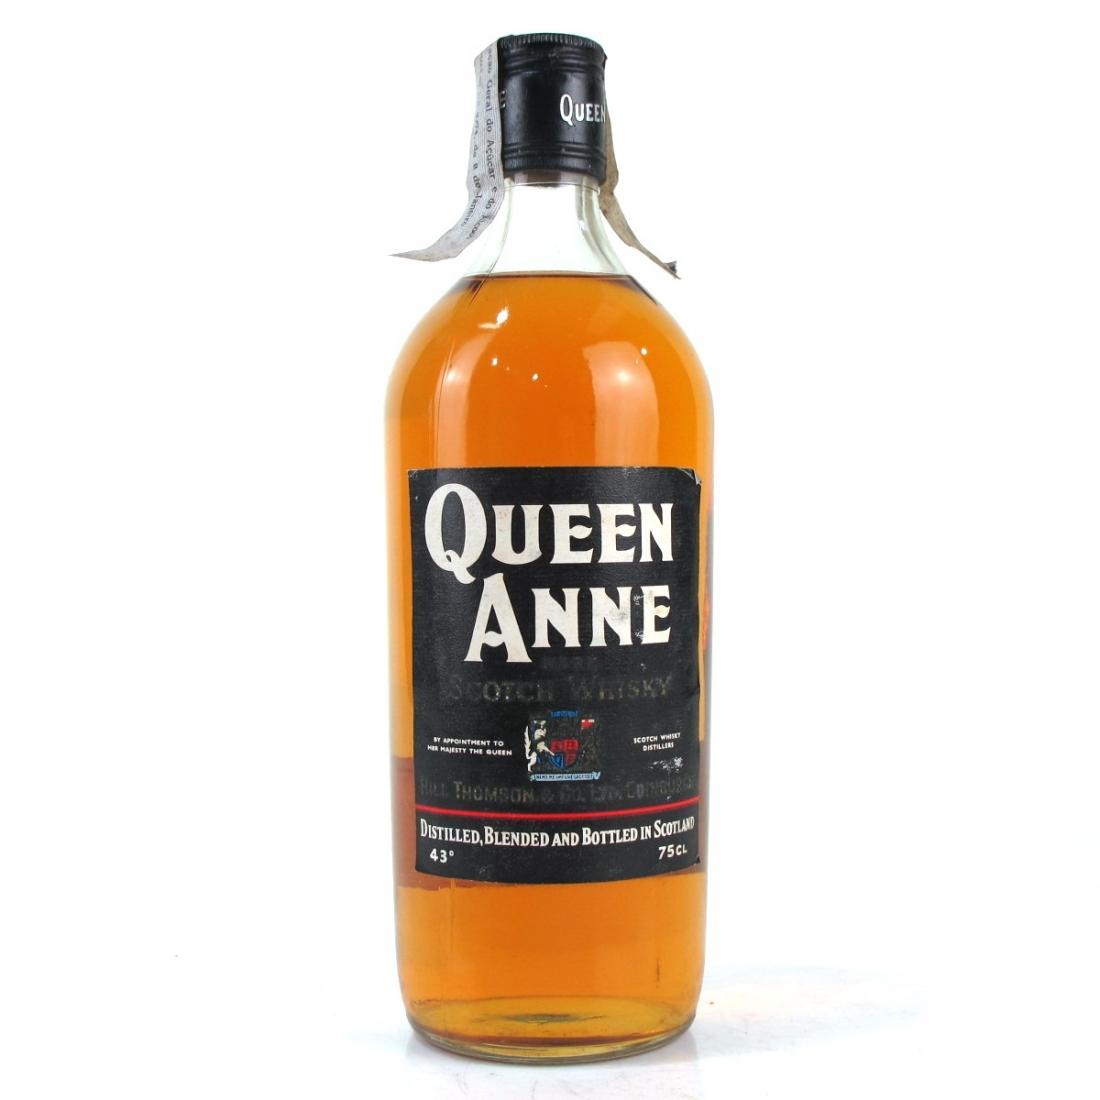 Queen Anne Rare Scotch 1970s / Portuguese Import